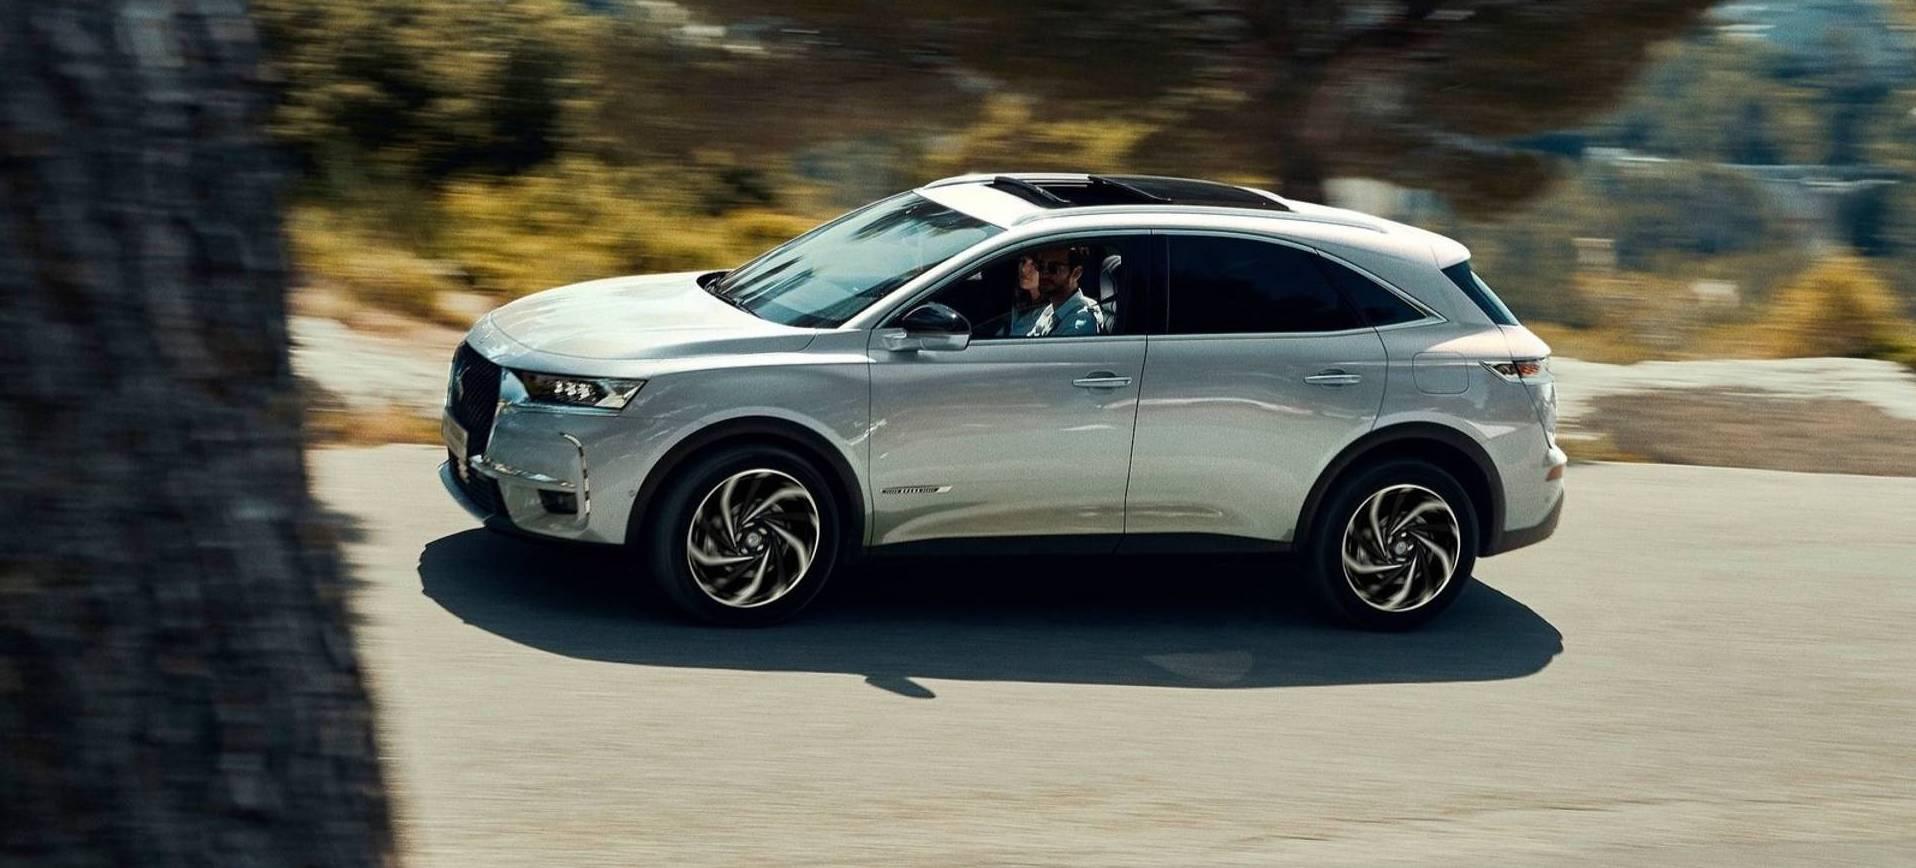 ds 7 crossback e tense 4x4 suv hybride premium les voitures. Black Bedroom Furniture Sets. Home Design Ideas